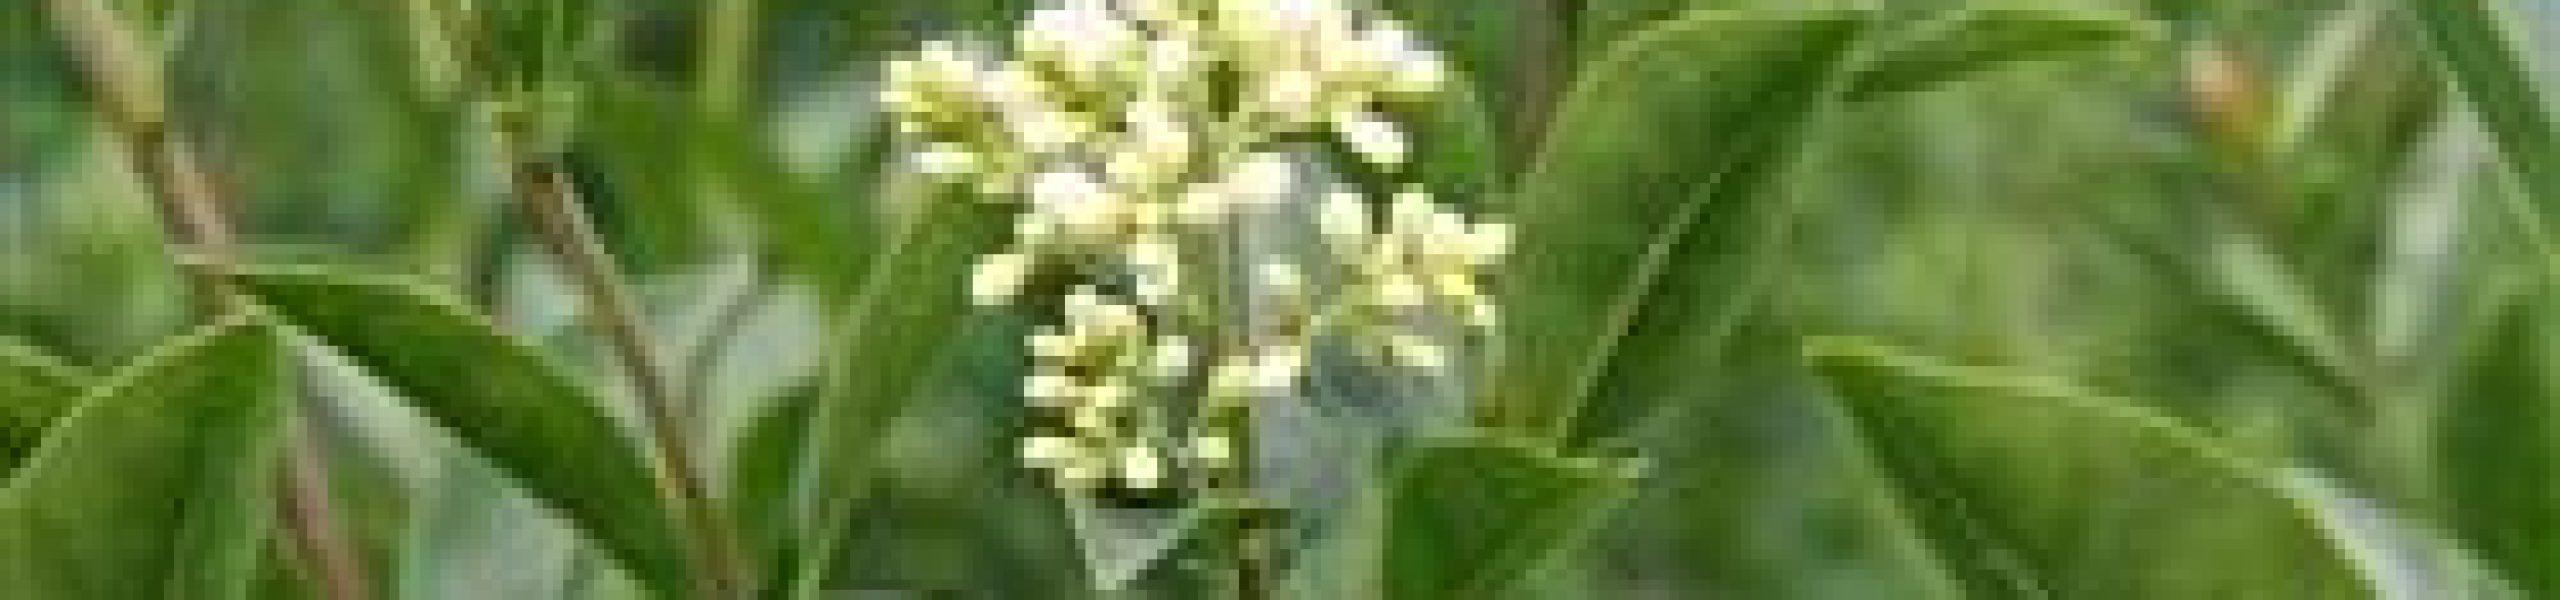 Ligustrum-vulgaris-liga